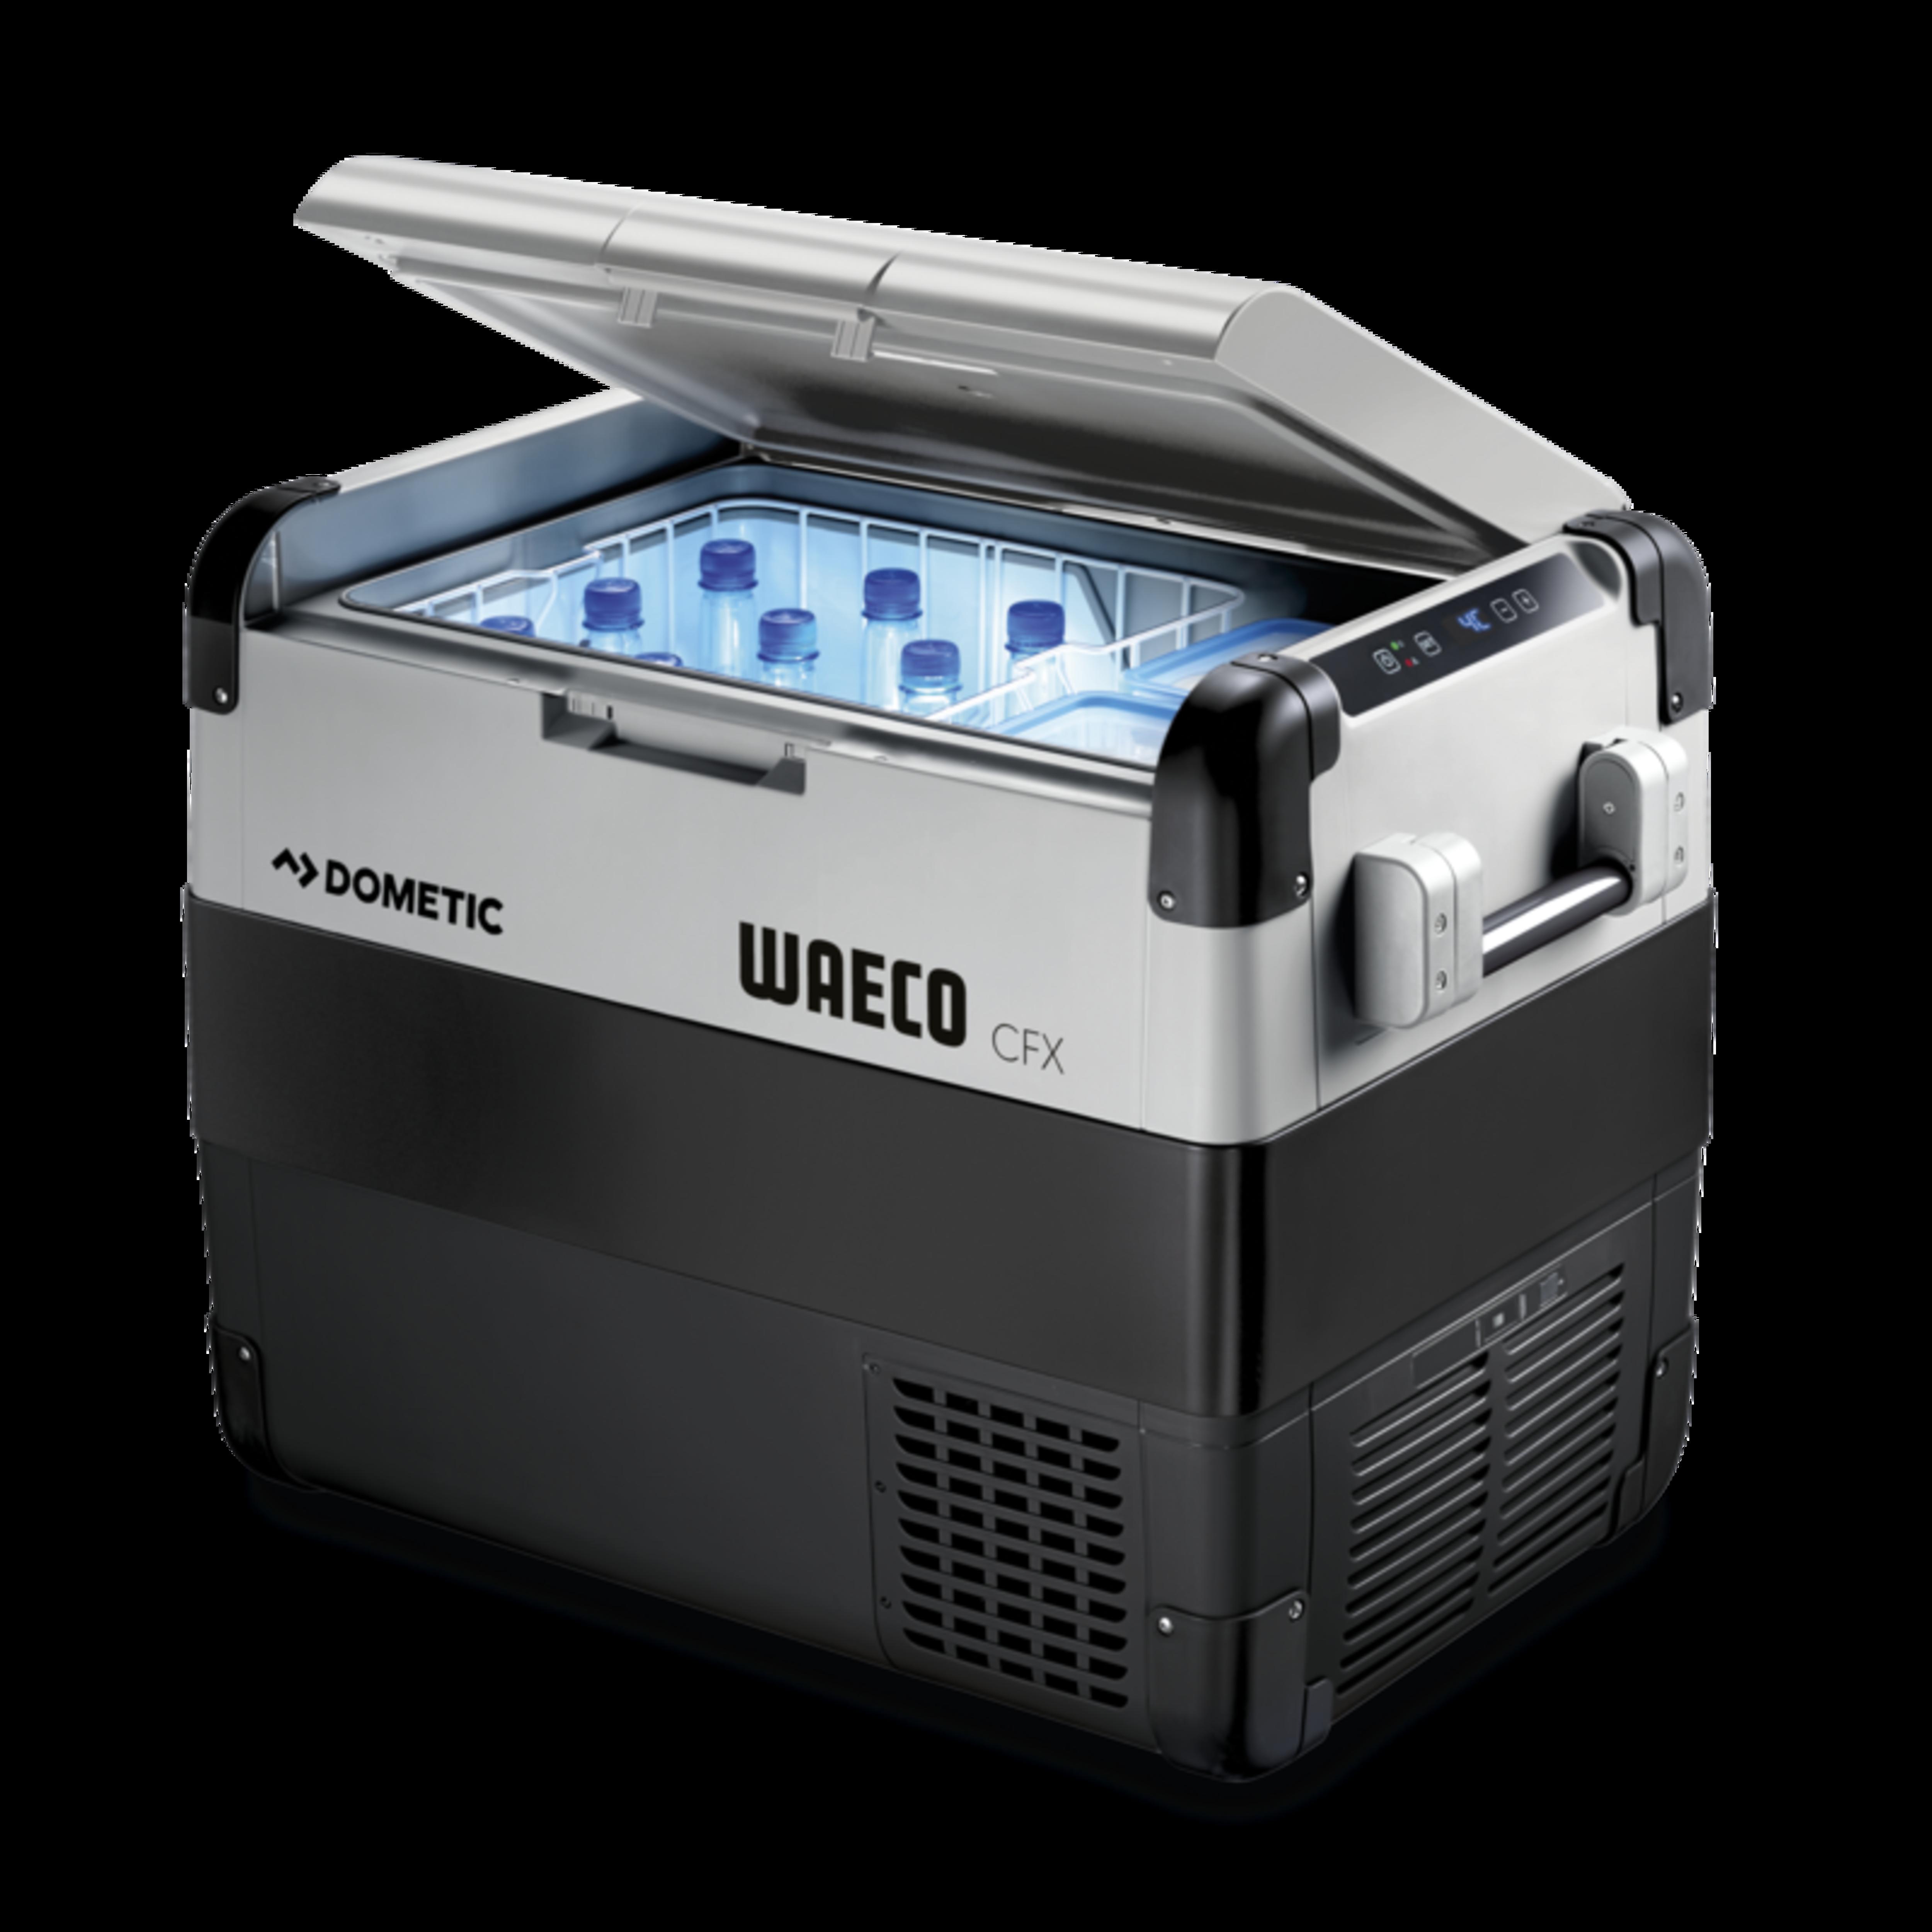 Dometic Waeco Cfx 65w  Freezer  106 Cans